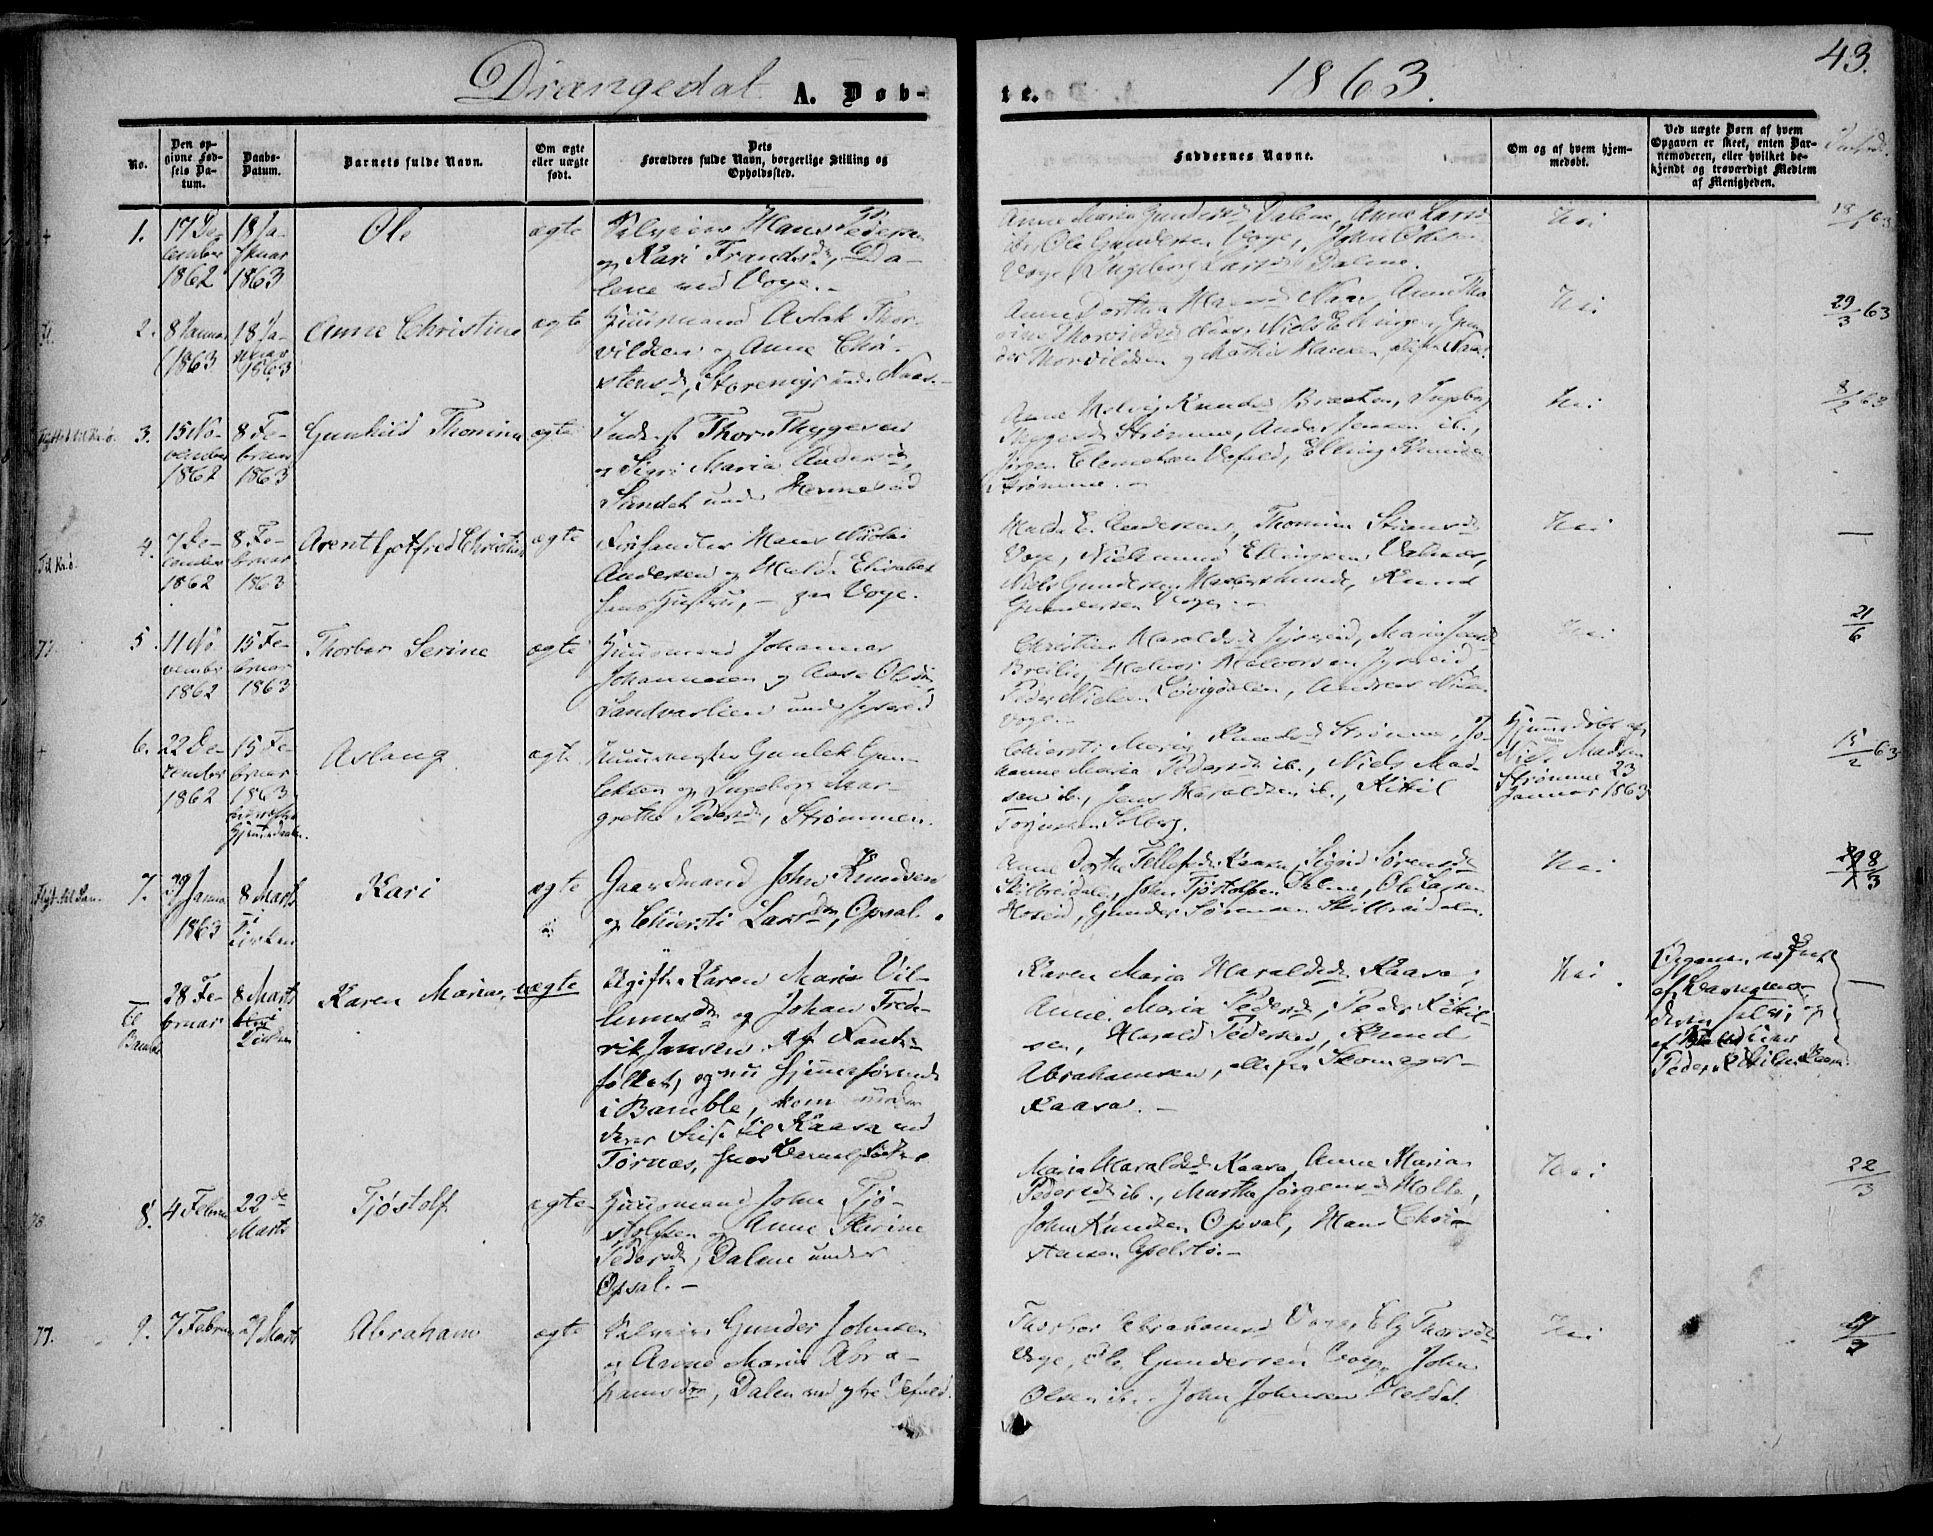 SAKO, Drangedal kirkebøker, F/Fa/L0008: Ministerialbok nr. 8, 1857-1871, s. 43